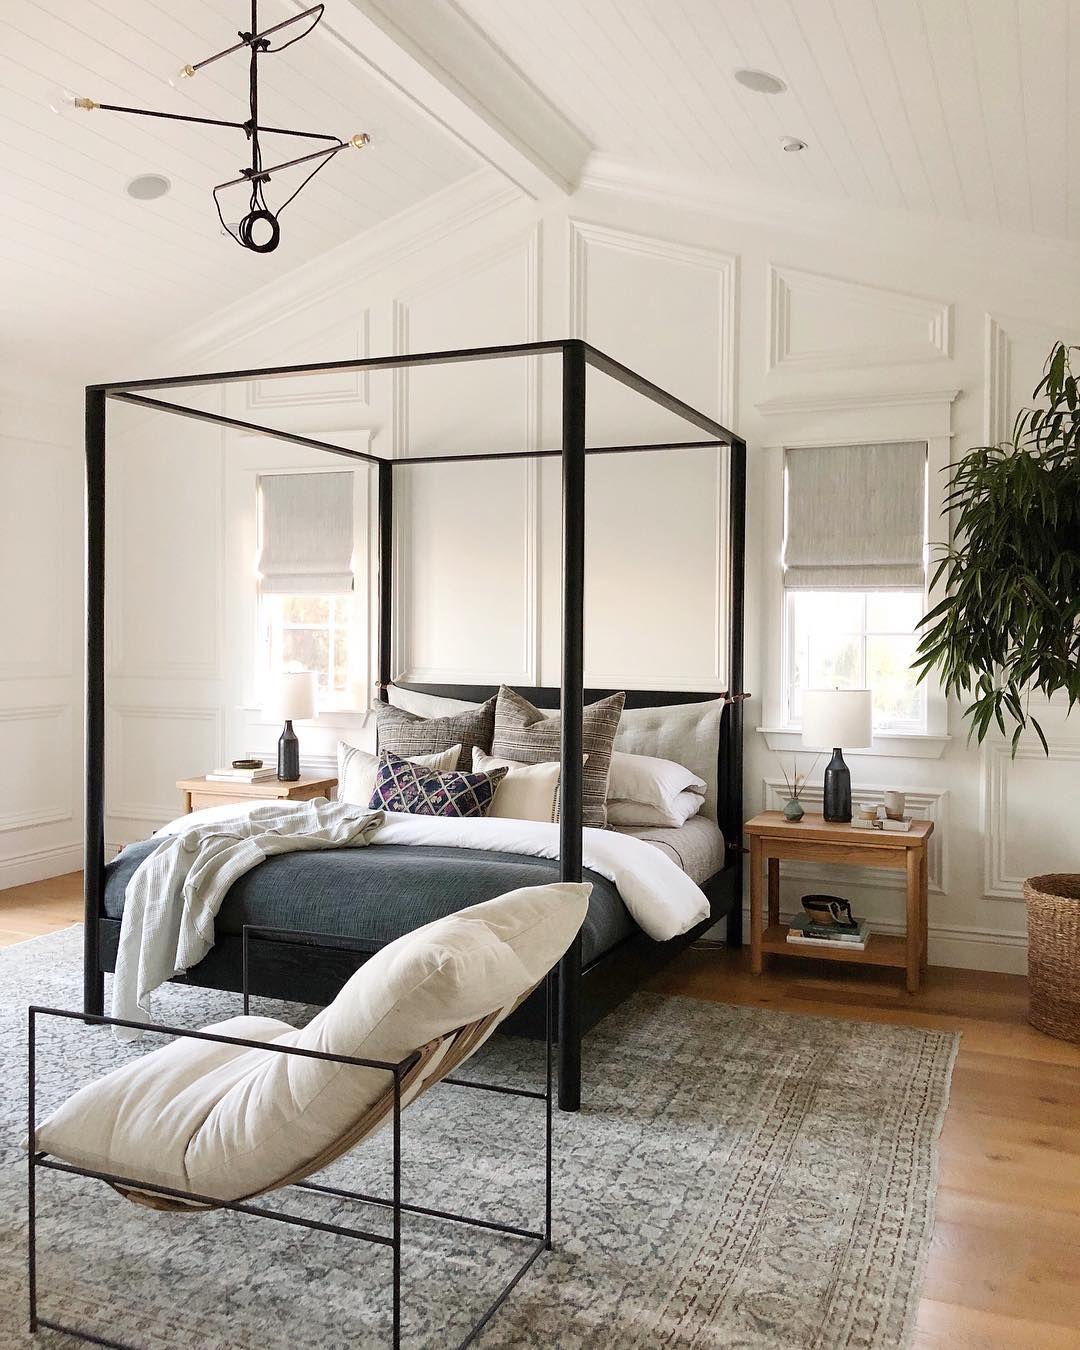 25 Insanely Affordable Vintage Inspired Rugs Bedroom Interior Home Decor Bedroom Bedroom Vintage